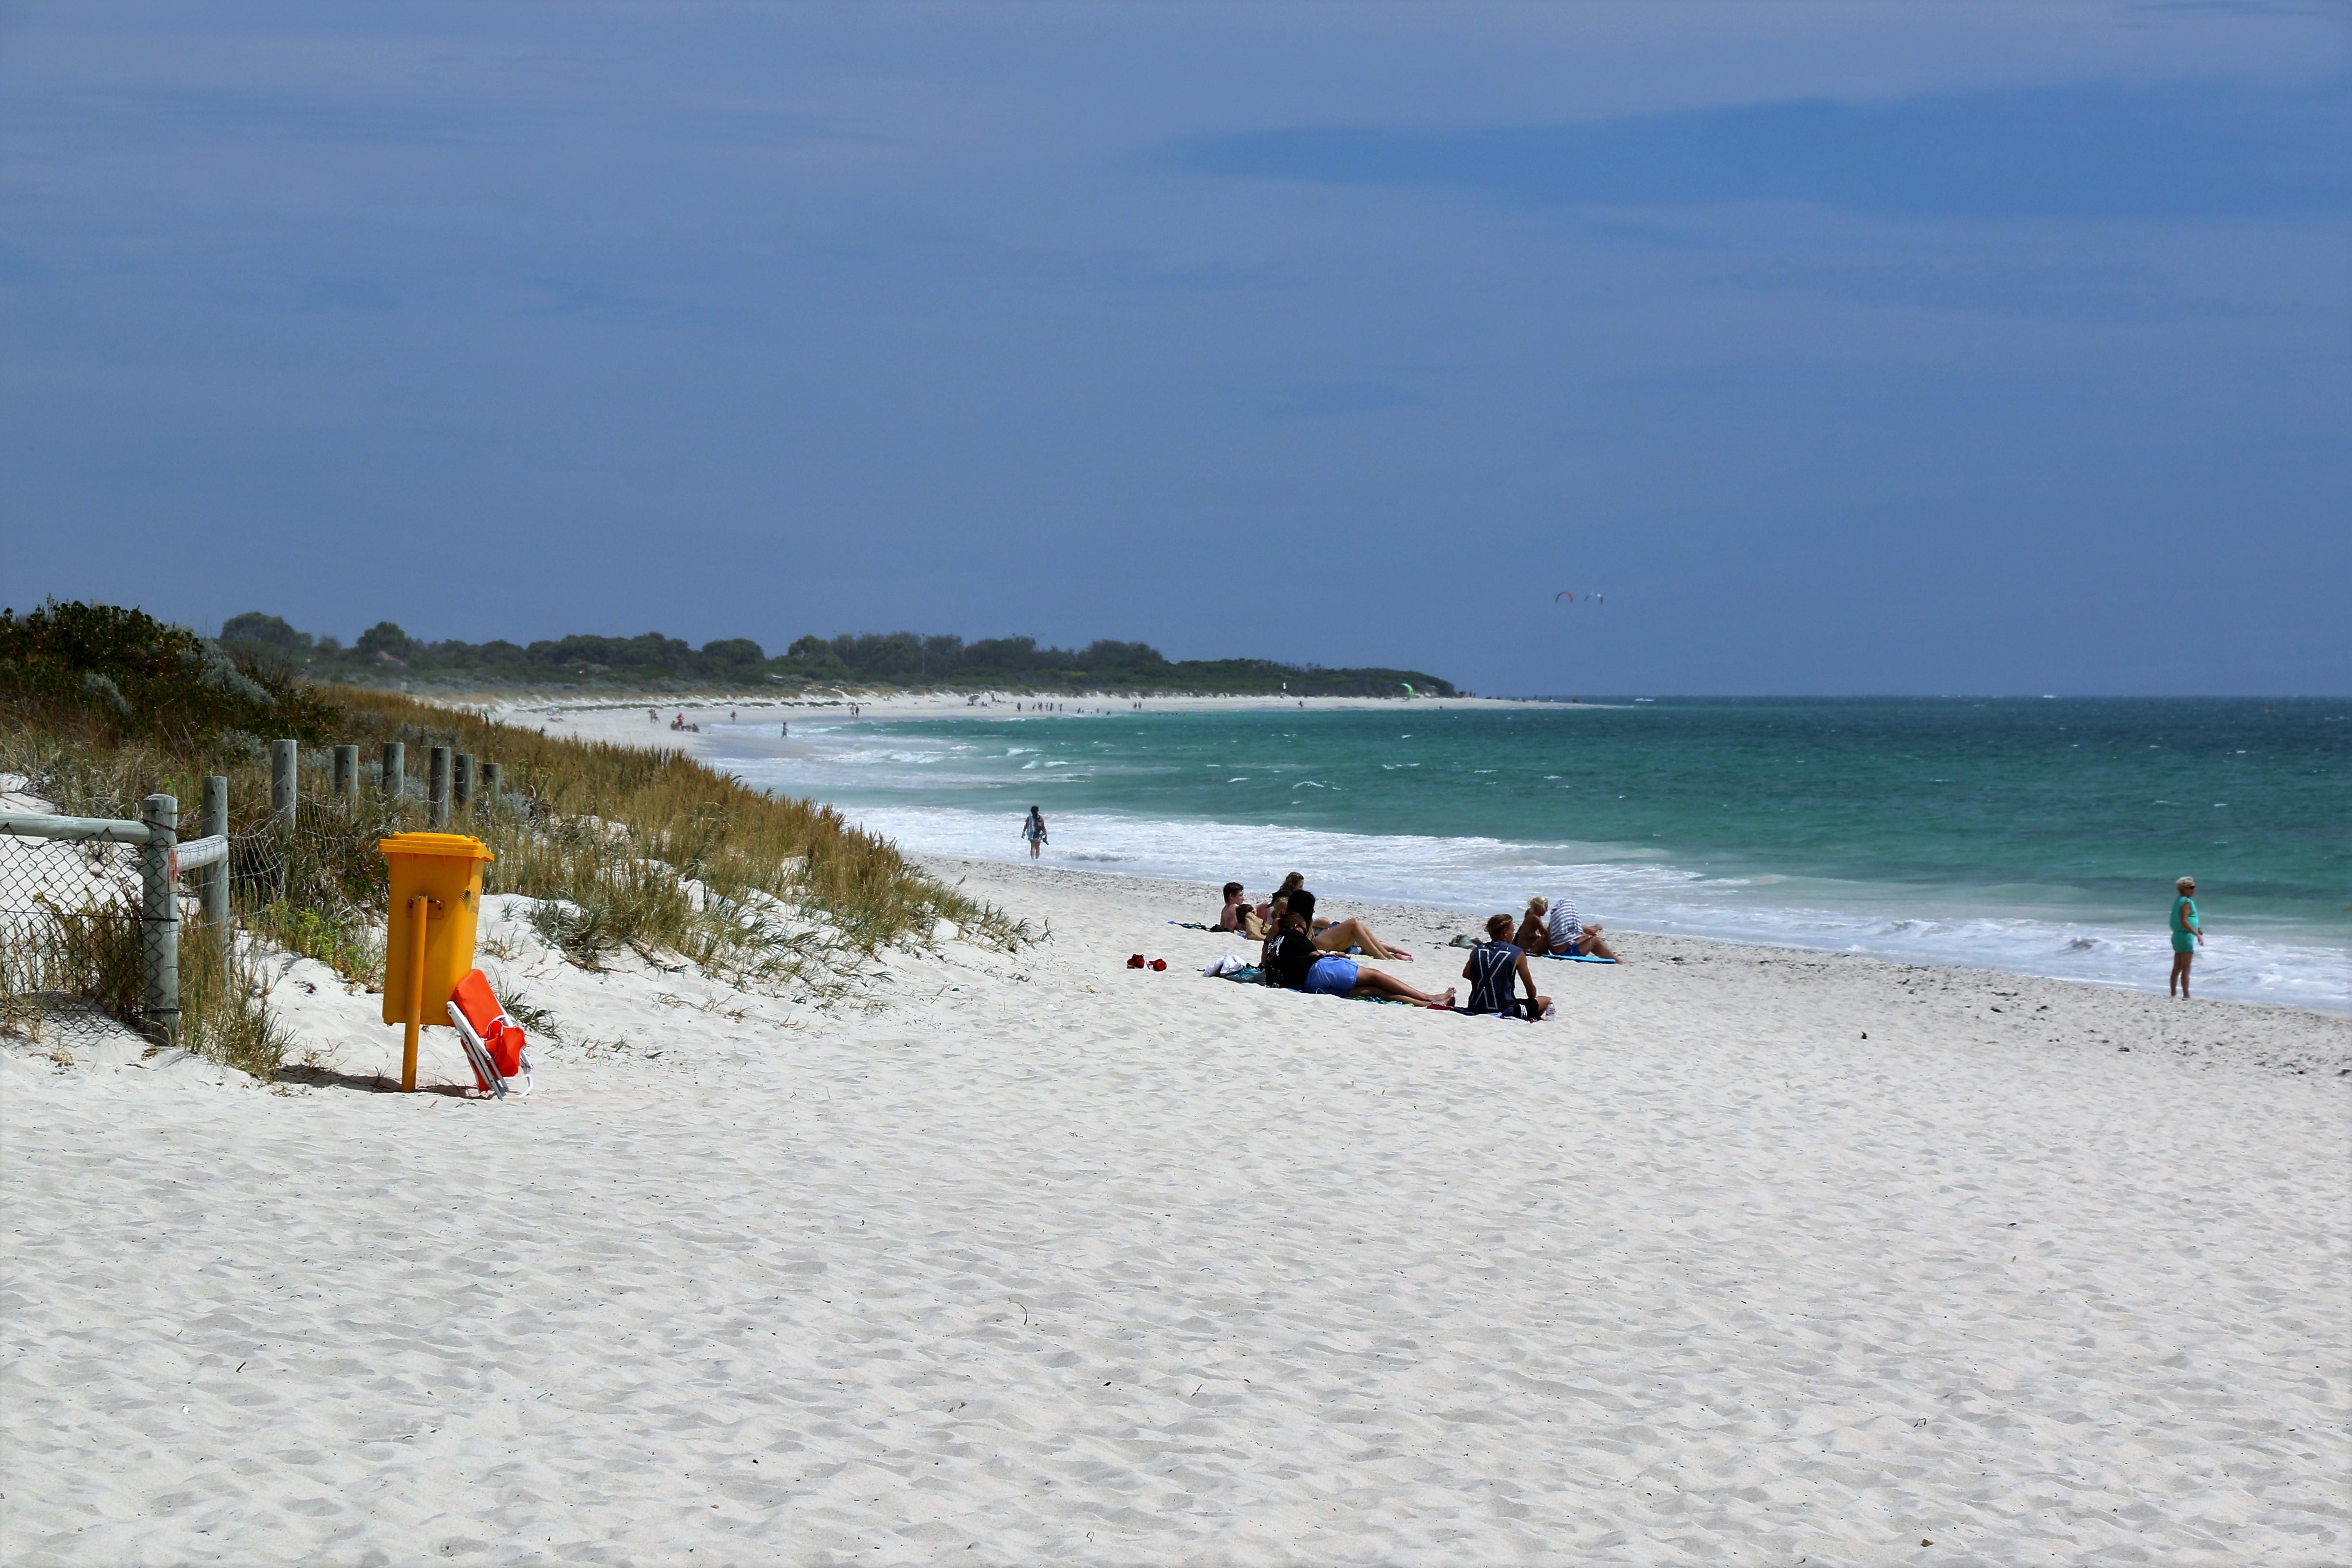 Mullaloo Beach - Looking South, WA